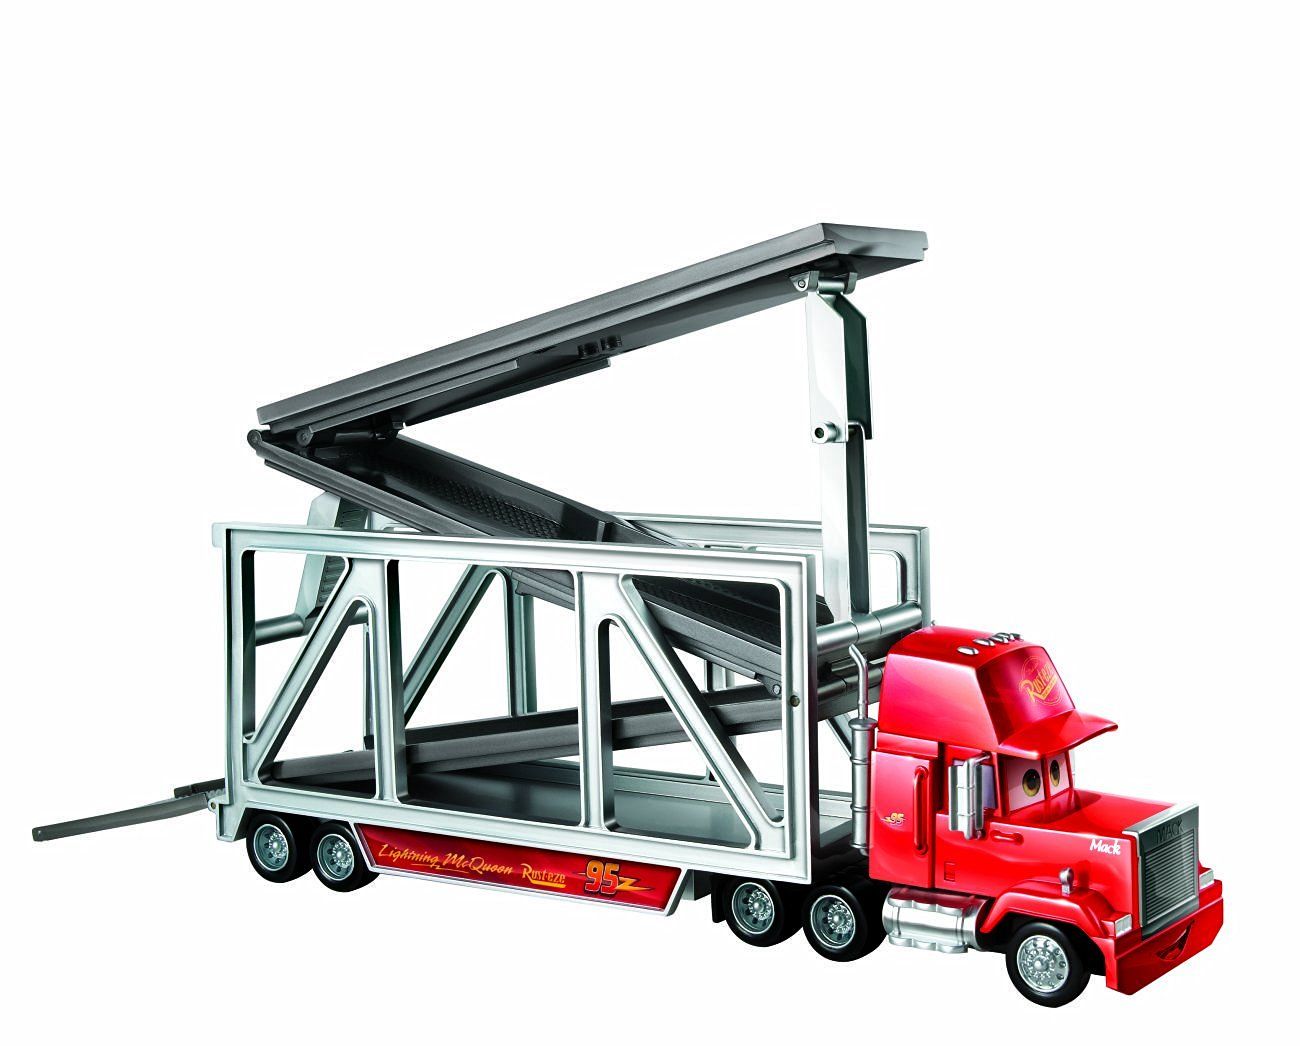 Cars Lift & Launch Mack Transporter